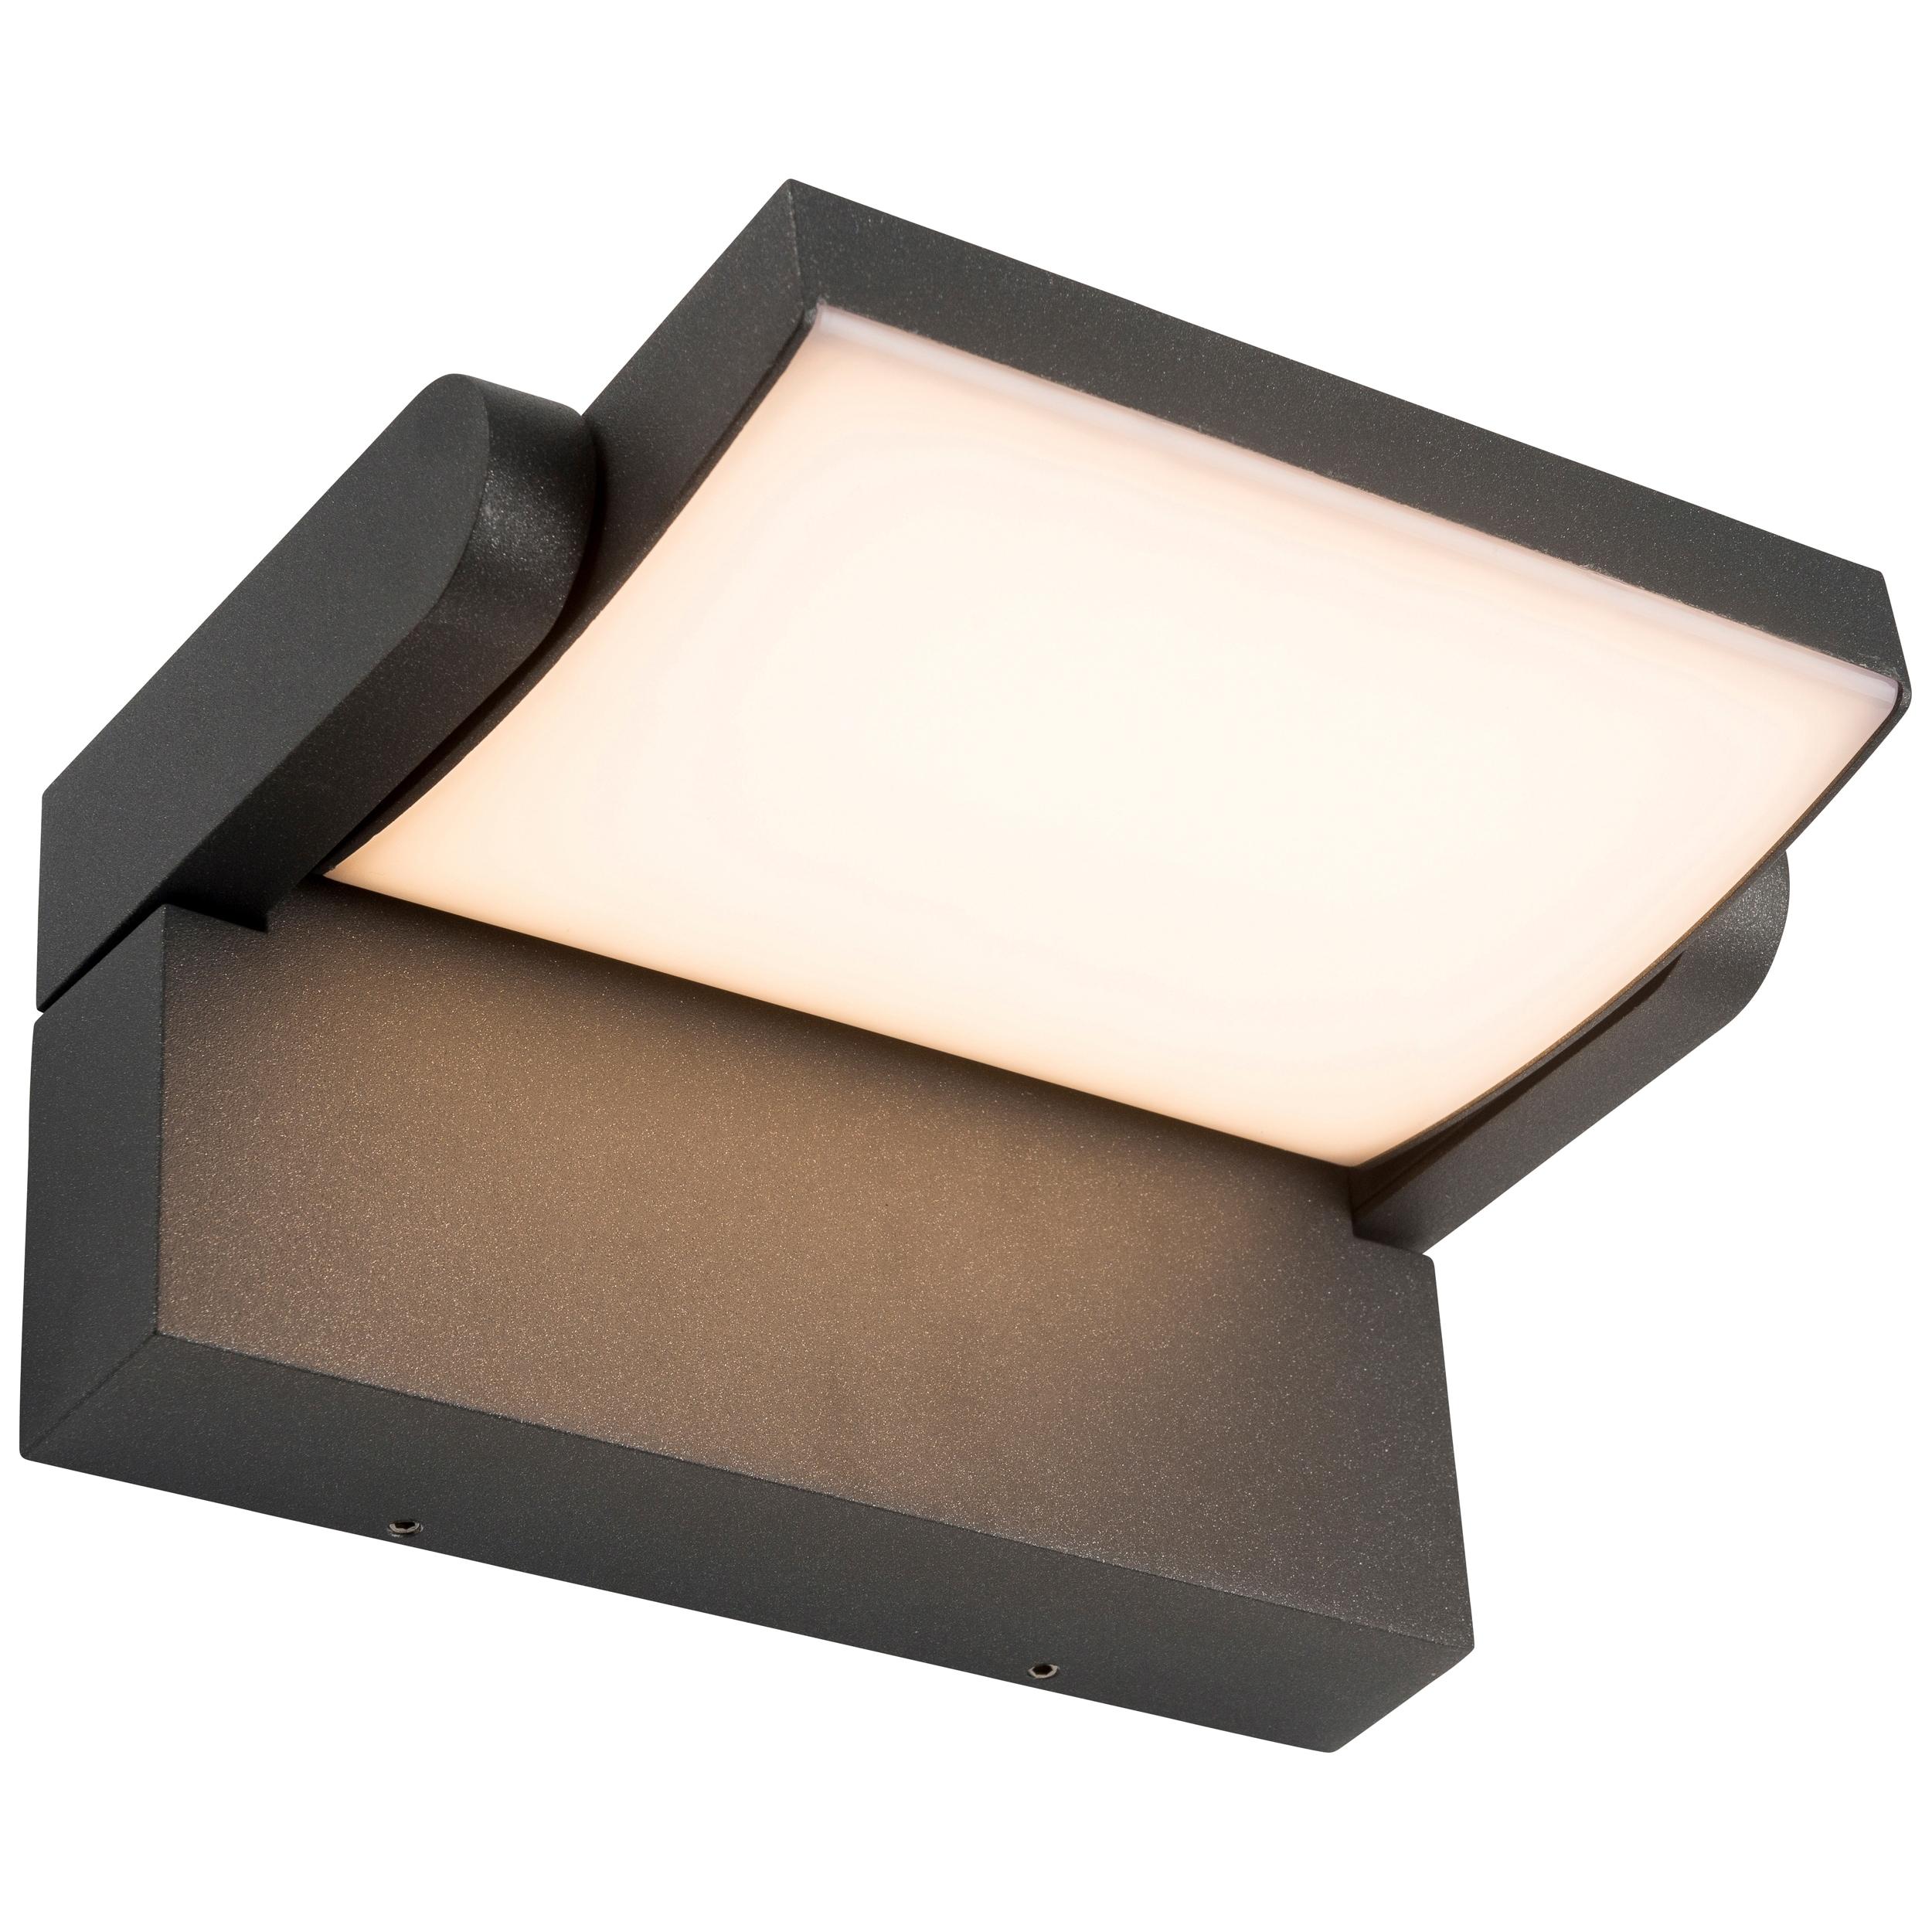 AEG Grady LED Außenwandleuchte anthrazit